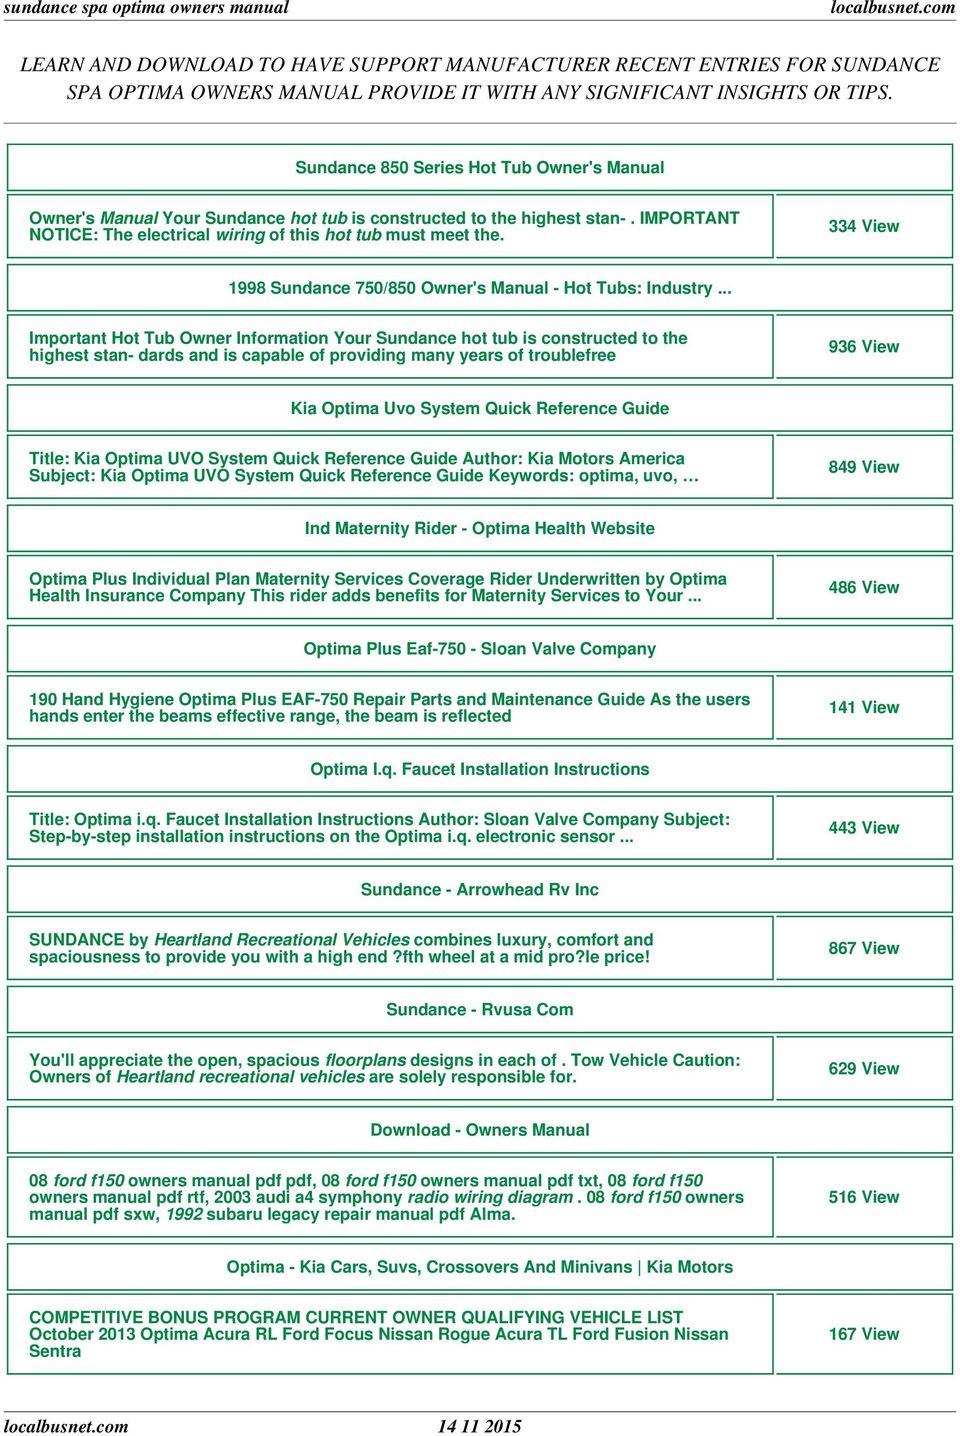 medium resolution of sundance spa optima owners manual pdf